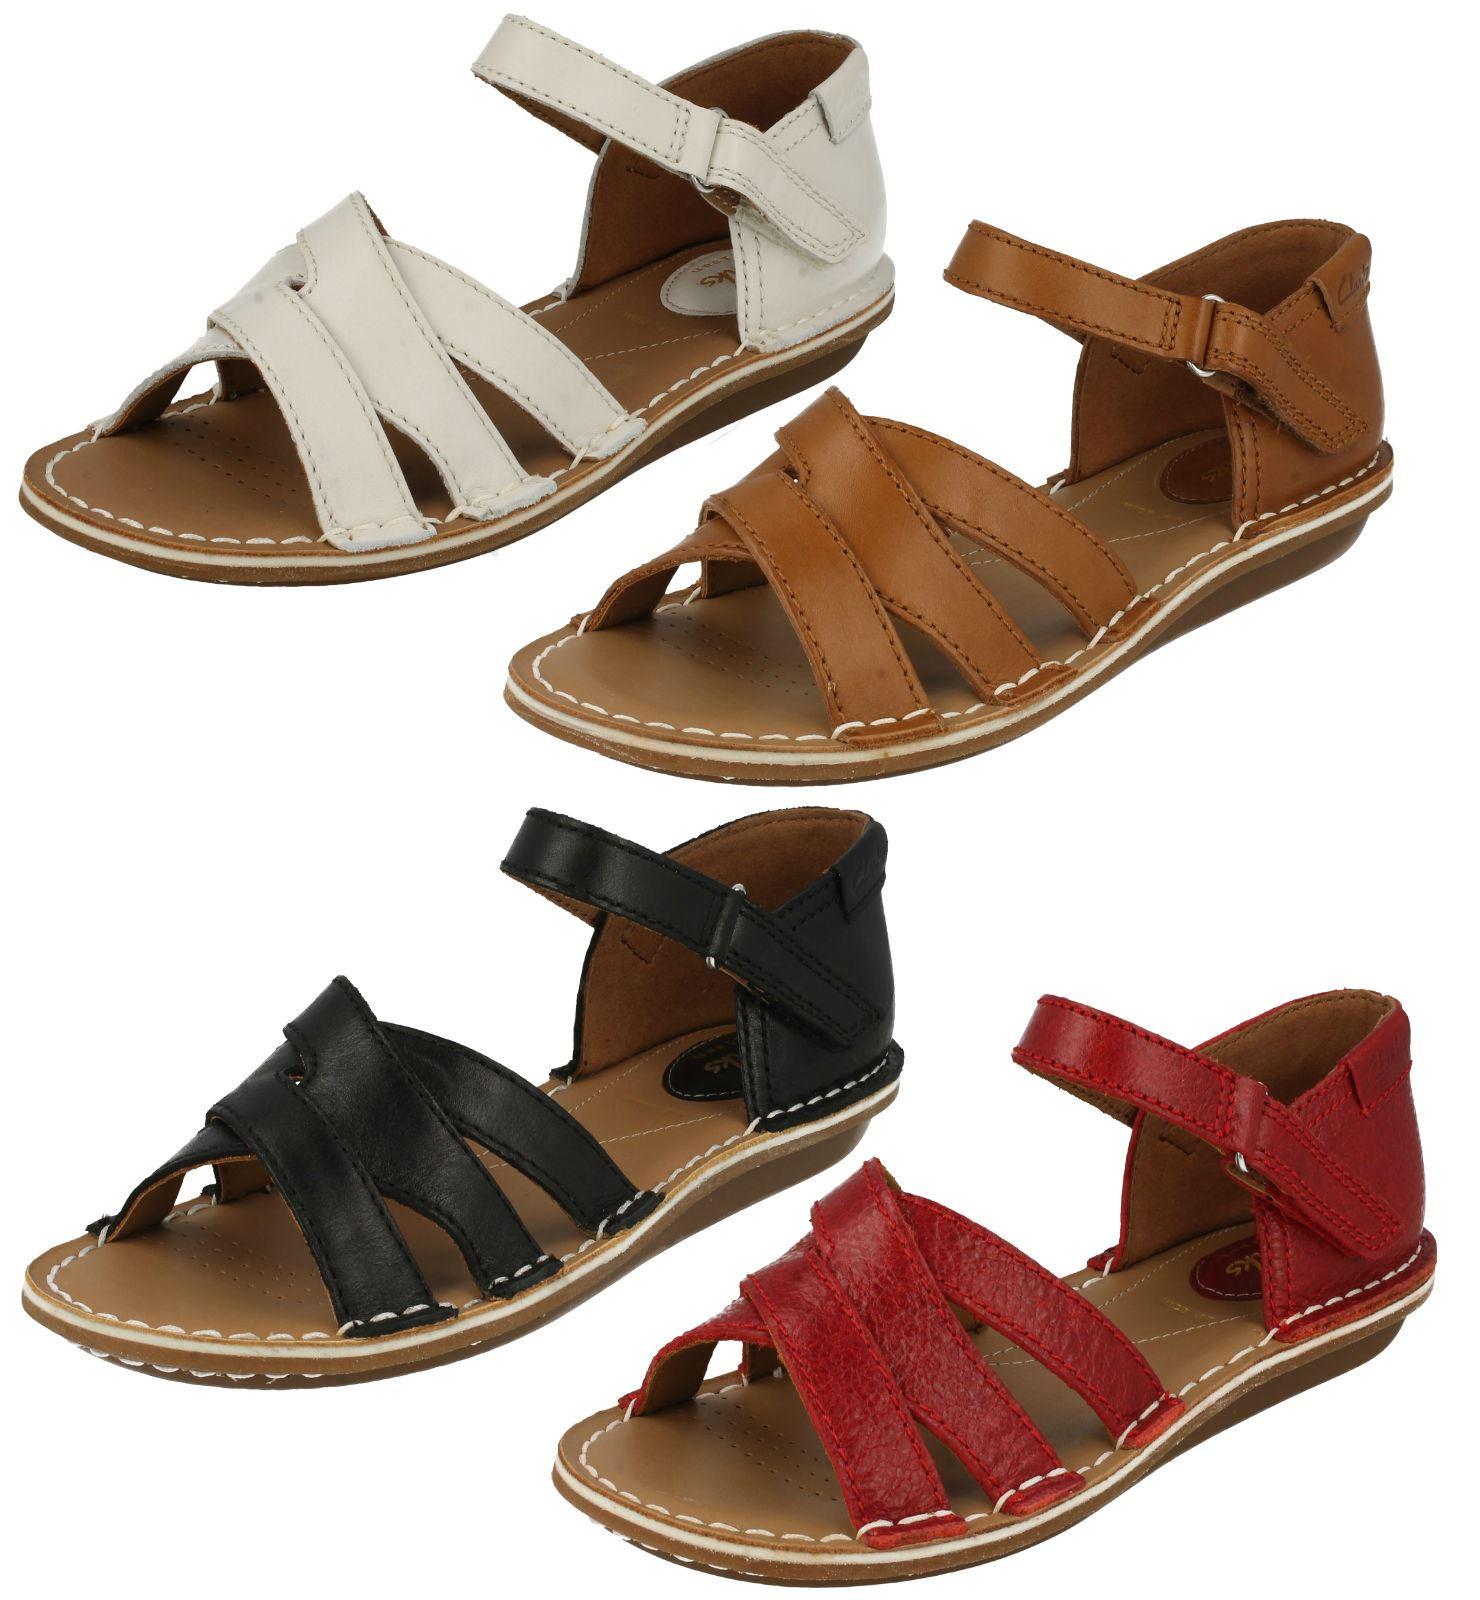 Shoe Shops On Tustin